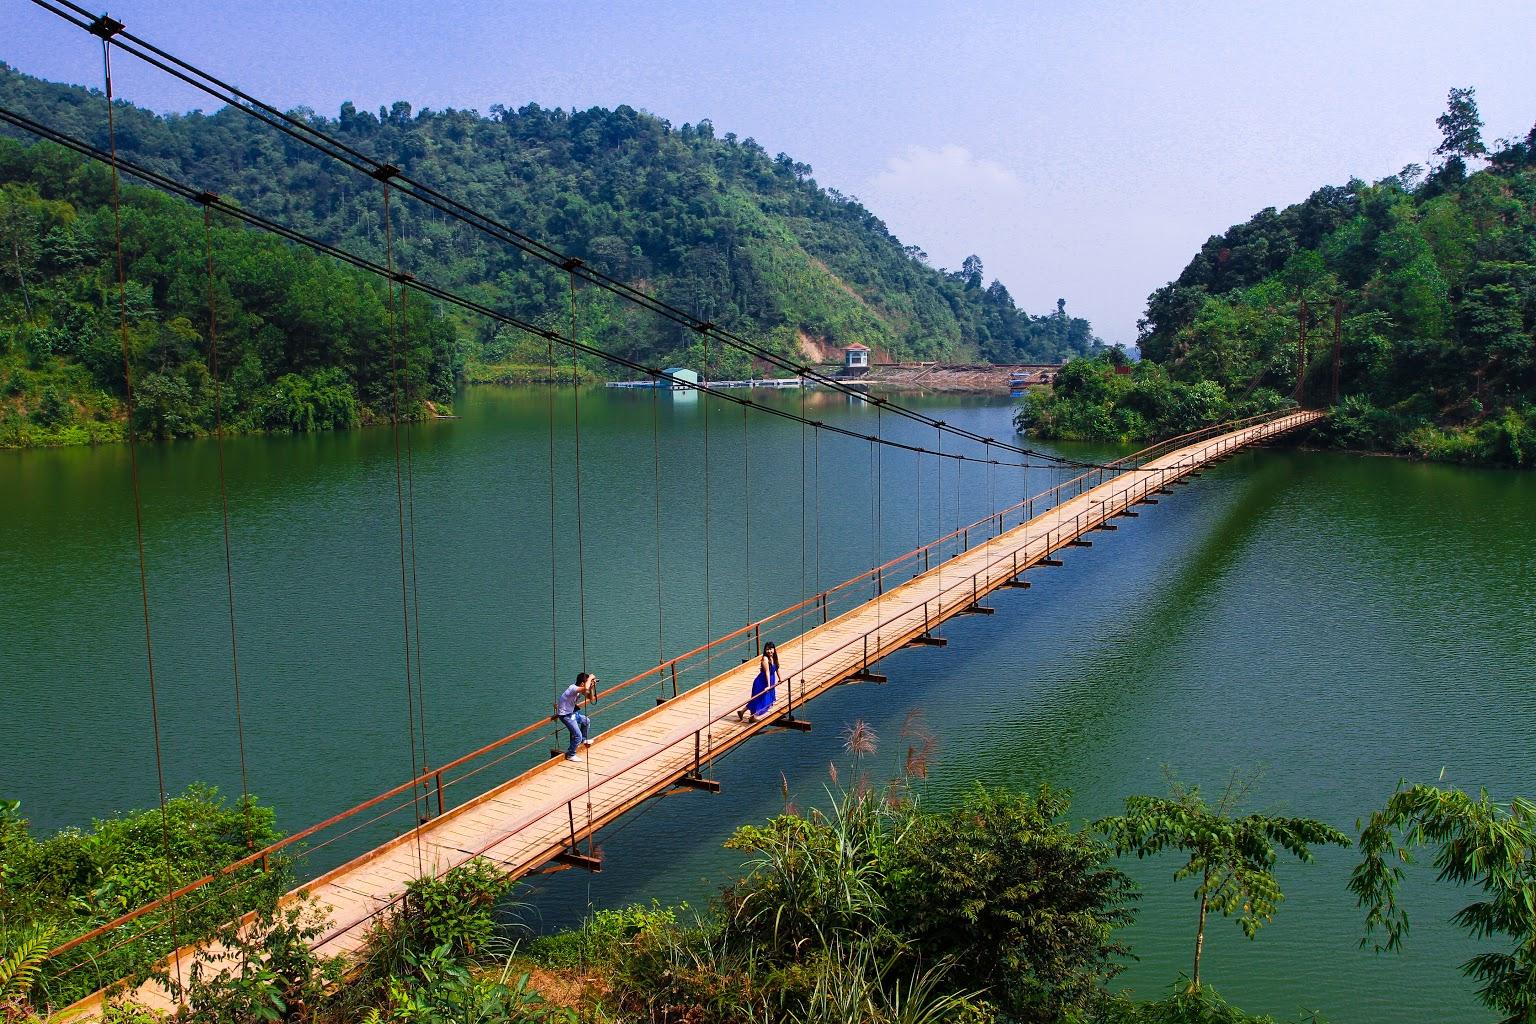 du lịch Phú Thọ 21